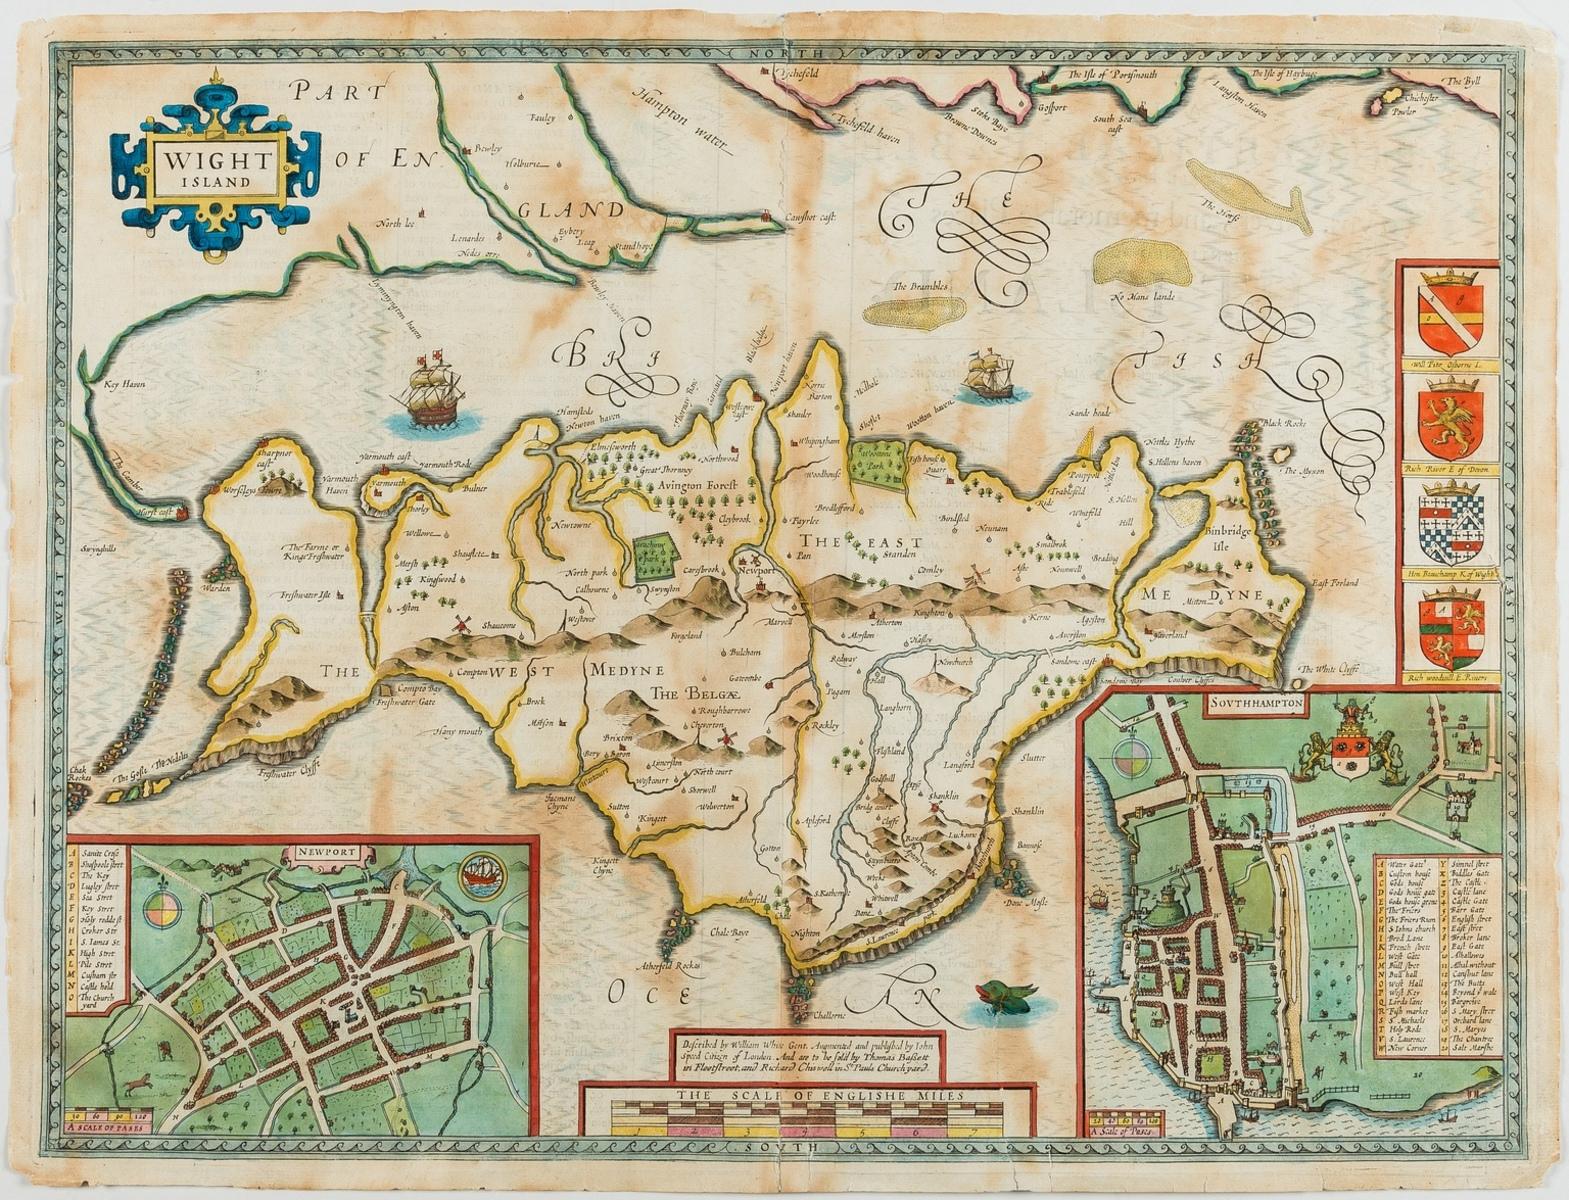 Isle of Wight.- Speed (John) Wight Island, [c. 1676].